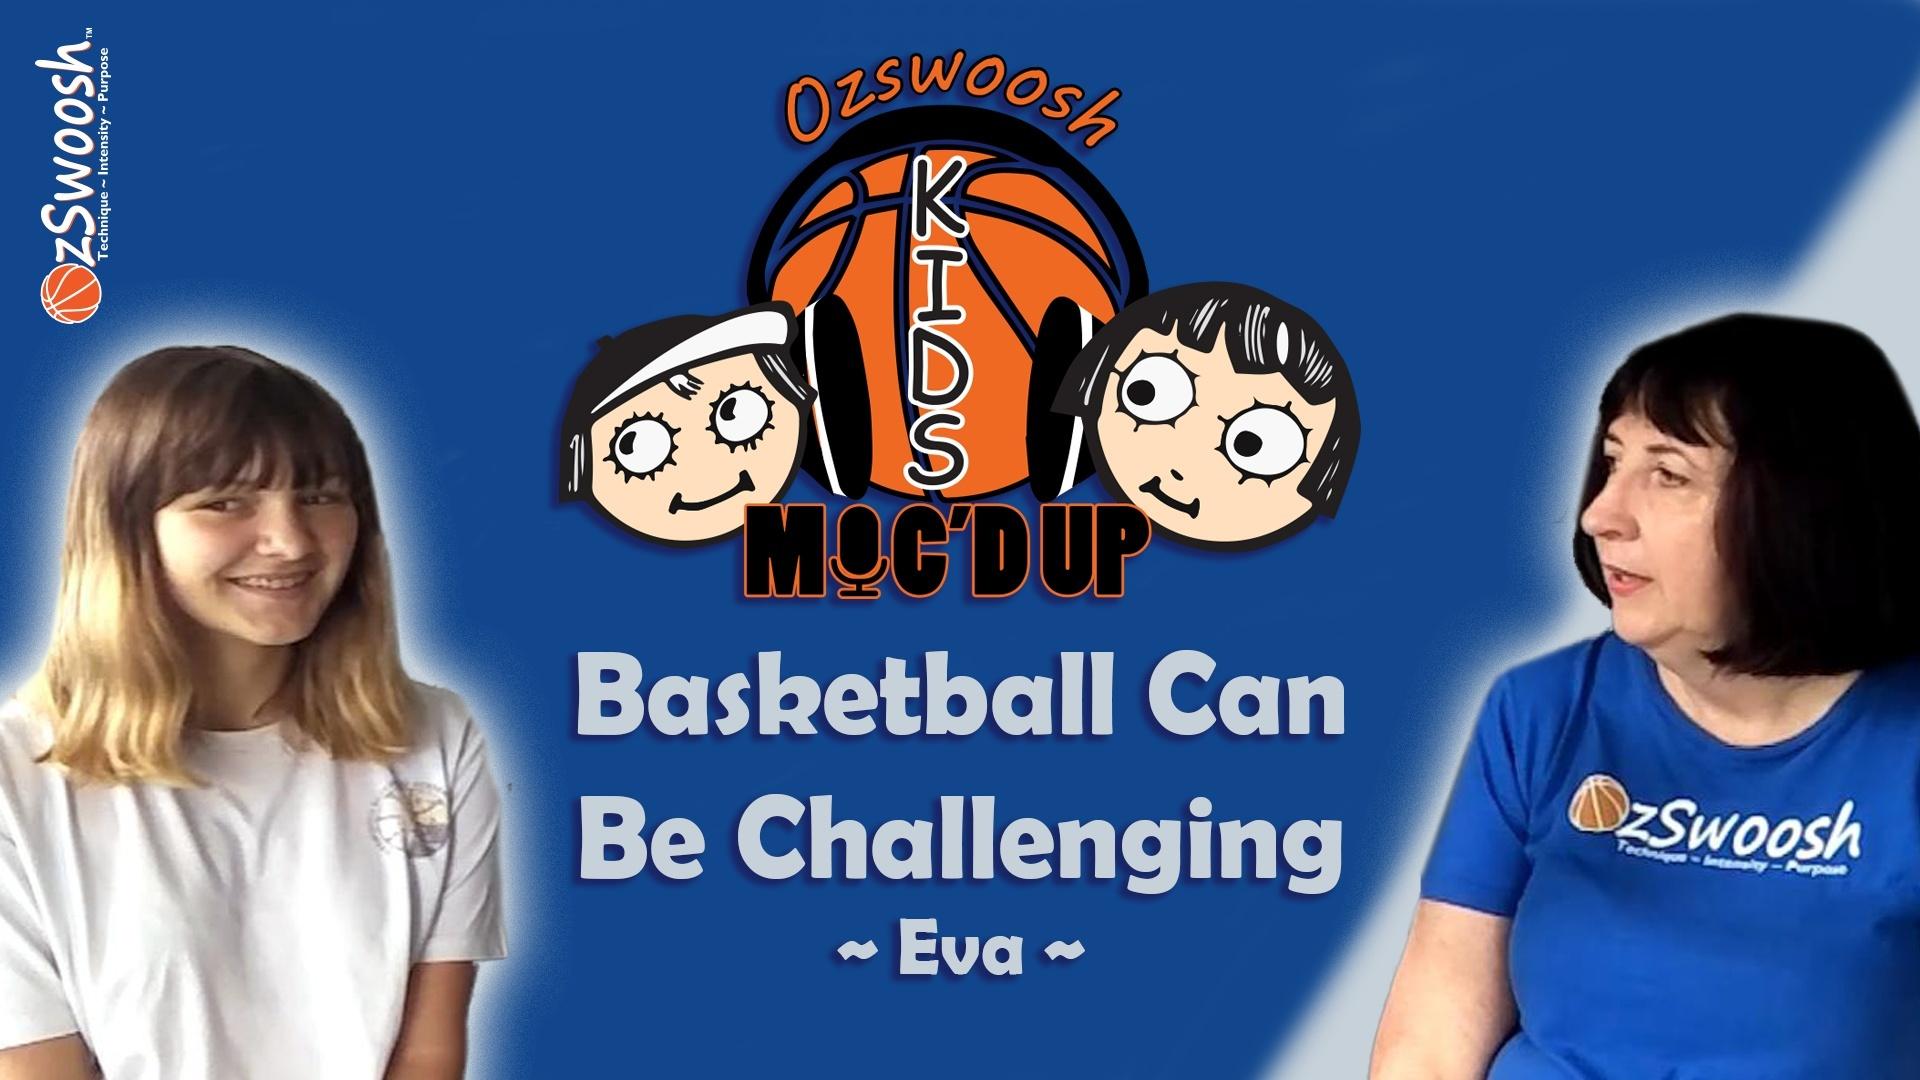 OzSwoosh Challenging Basketball Drills - Eva